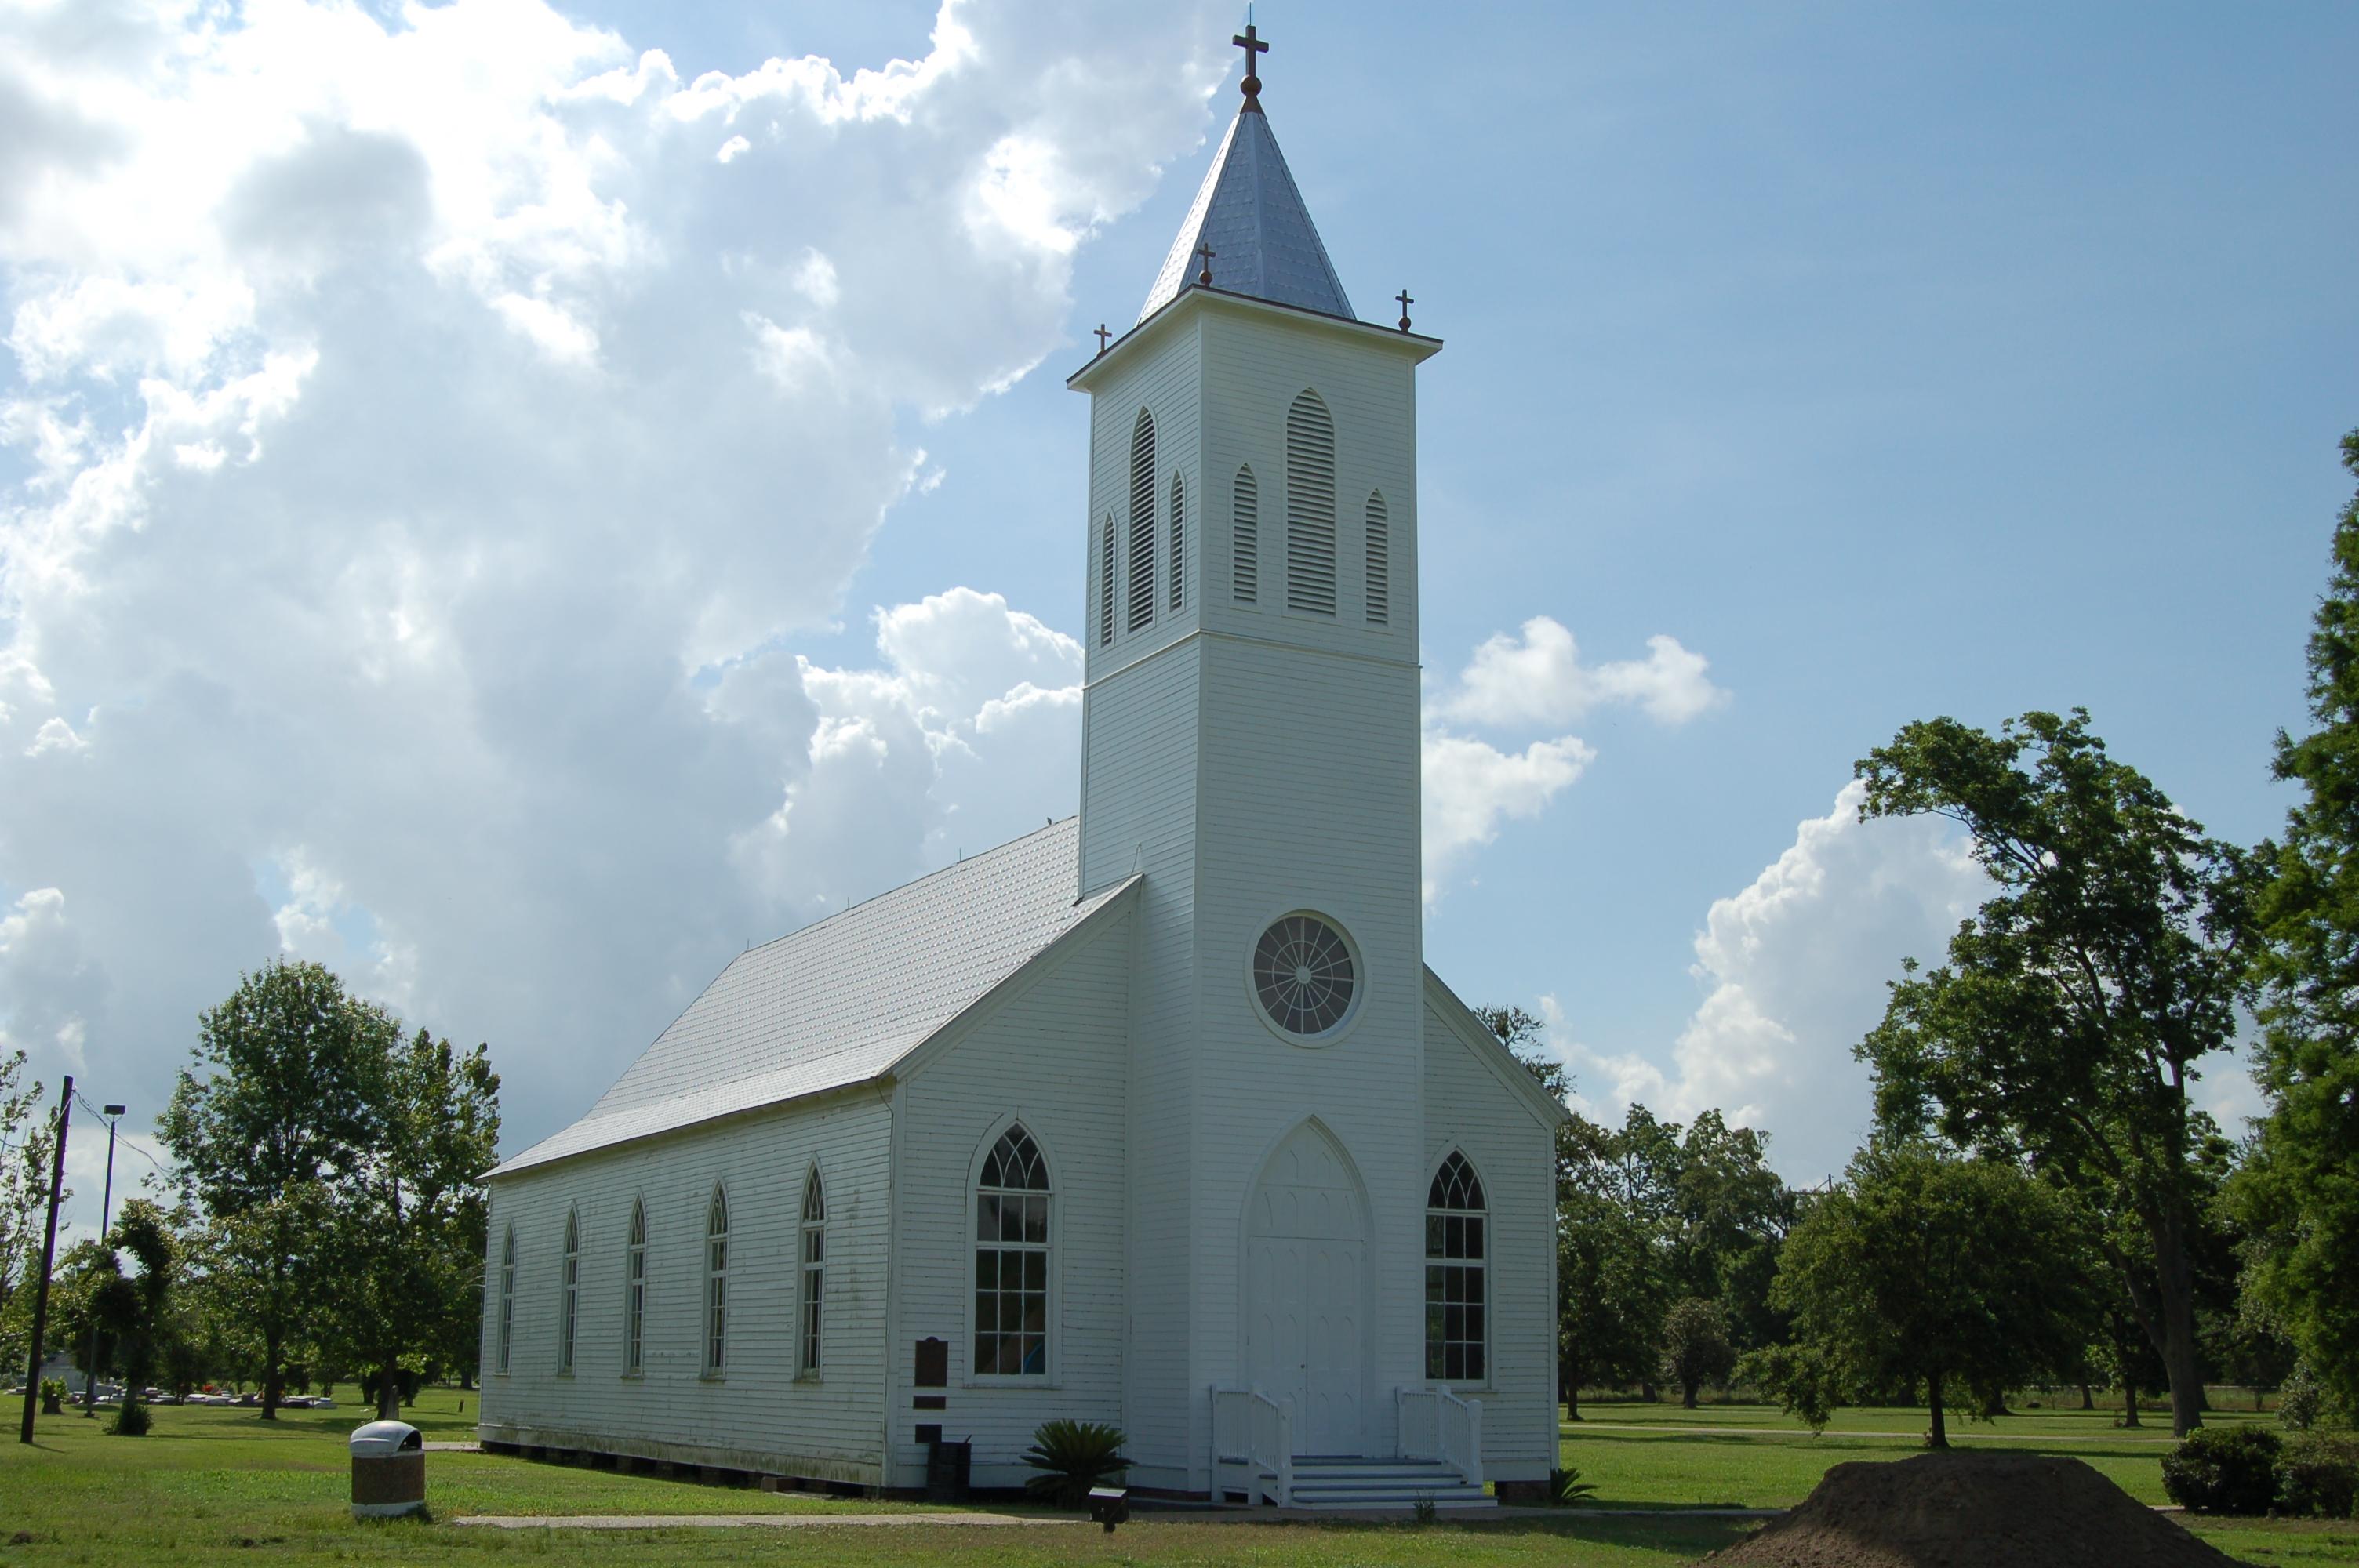 St. Gabriel (Luisiana)